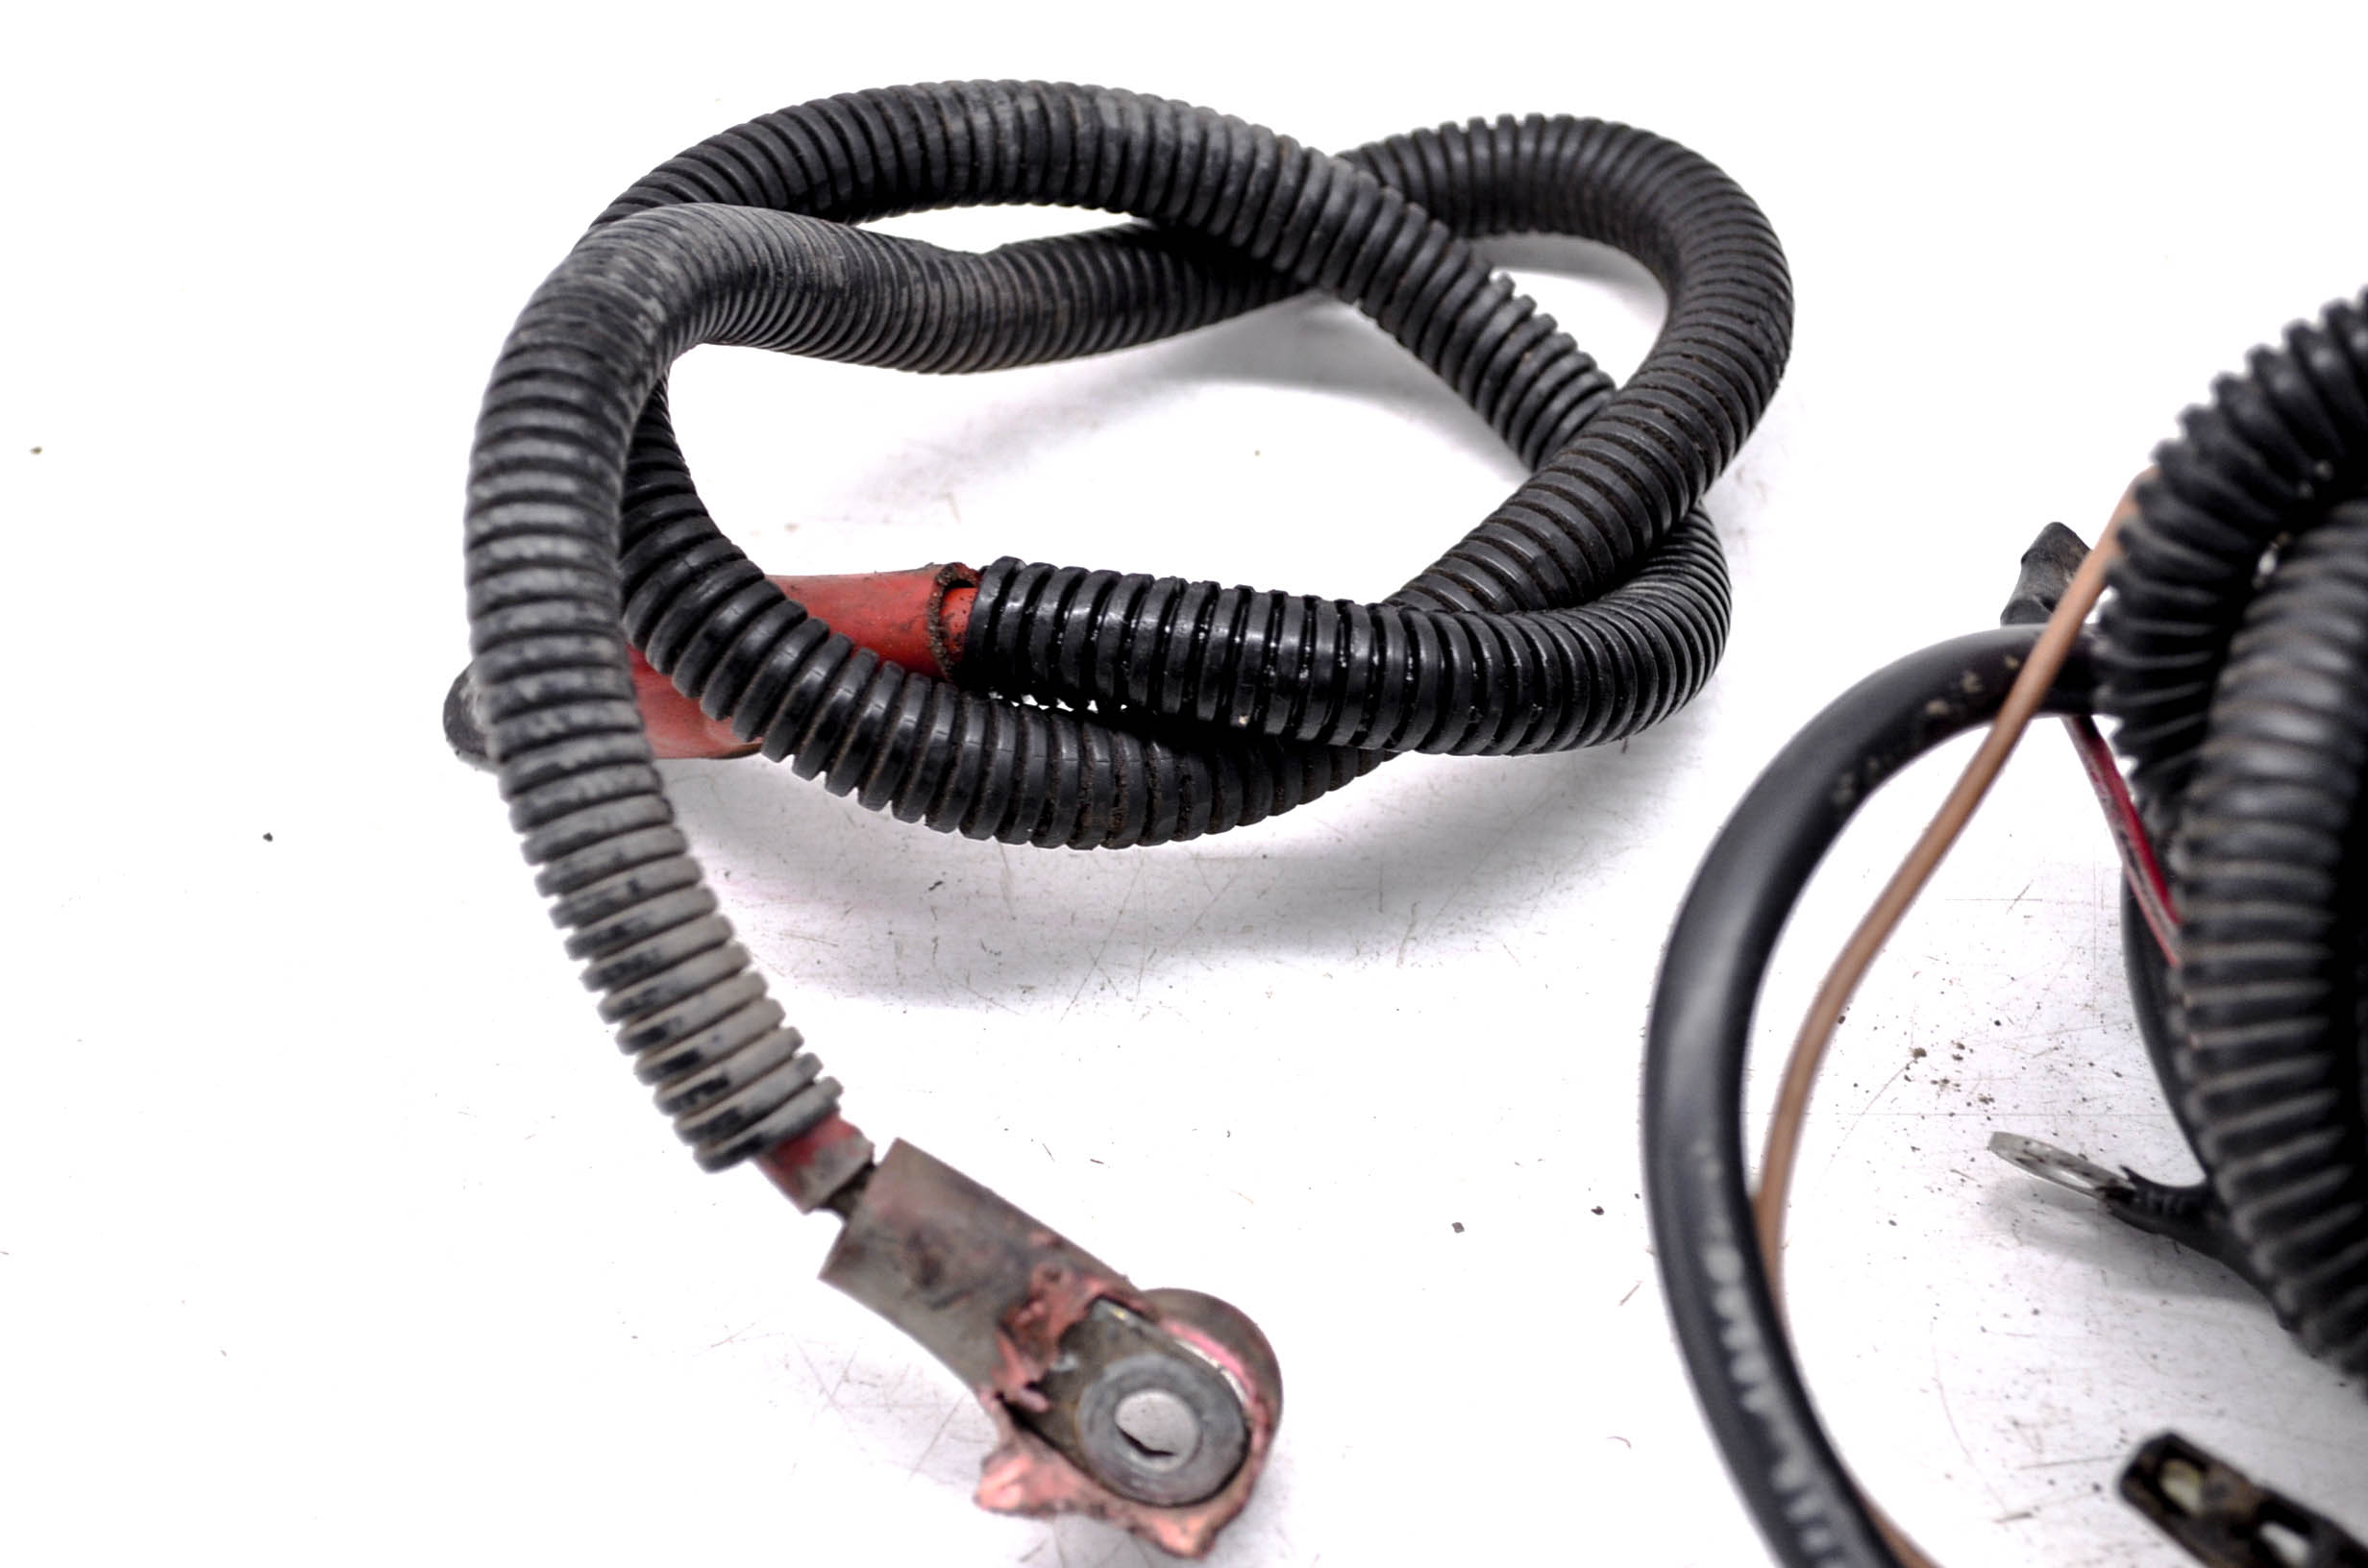 96 Polaris Xplorer 300 4x4 Wire Harness Electrical Wiring Ebay For 99 Suzuki Click To Enlarge